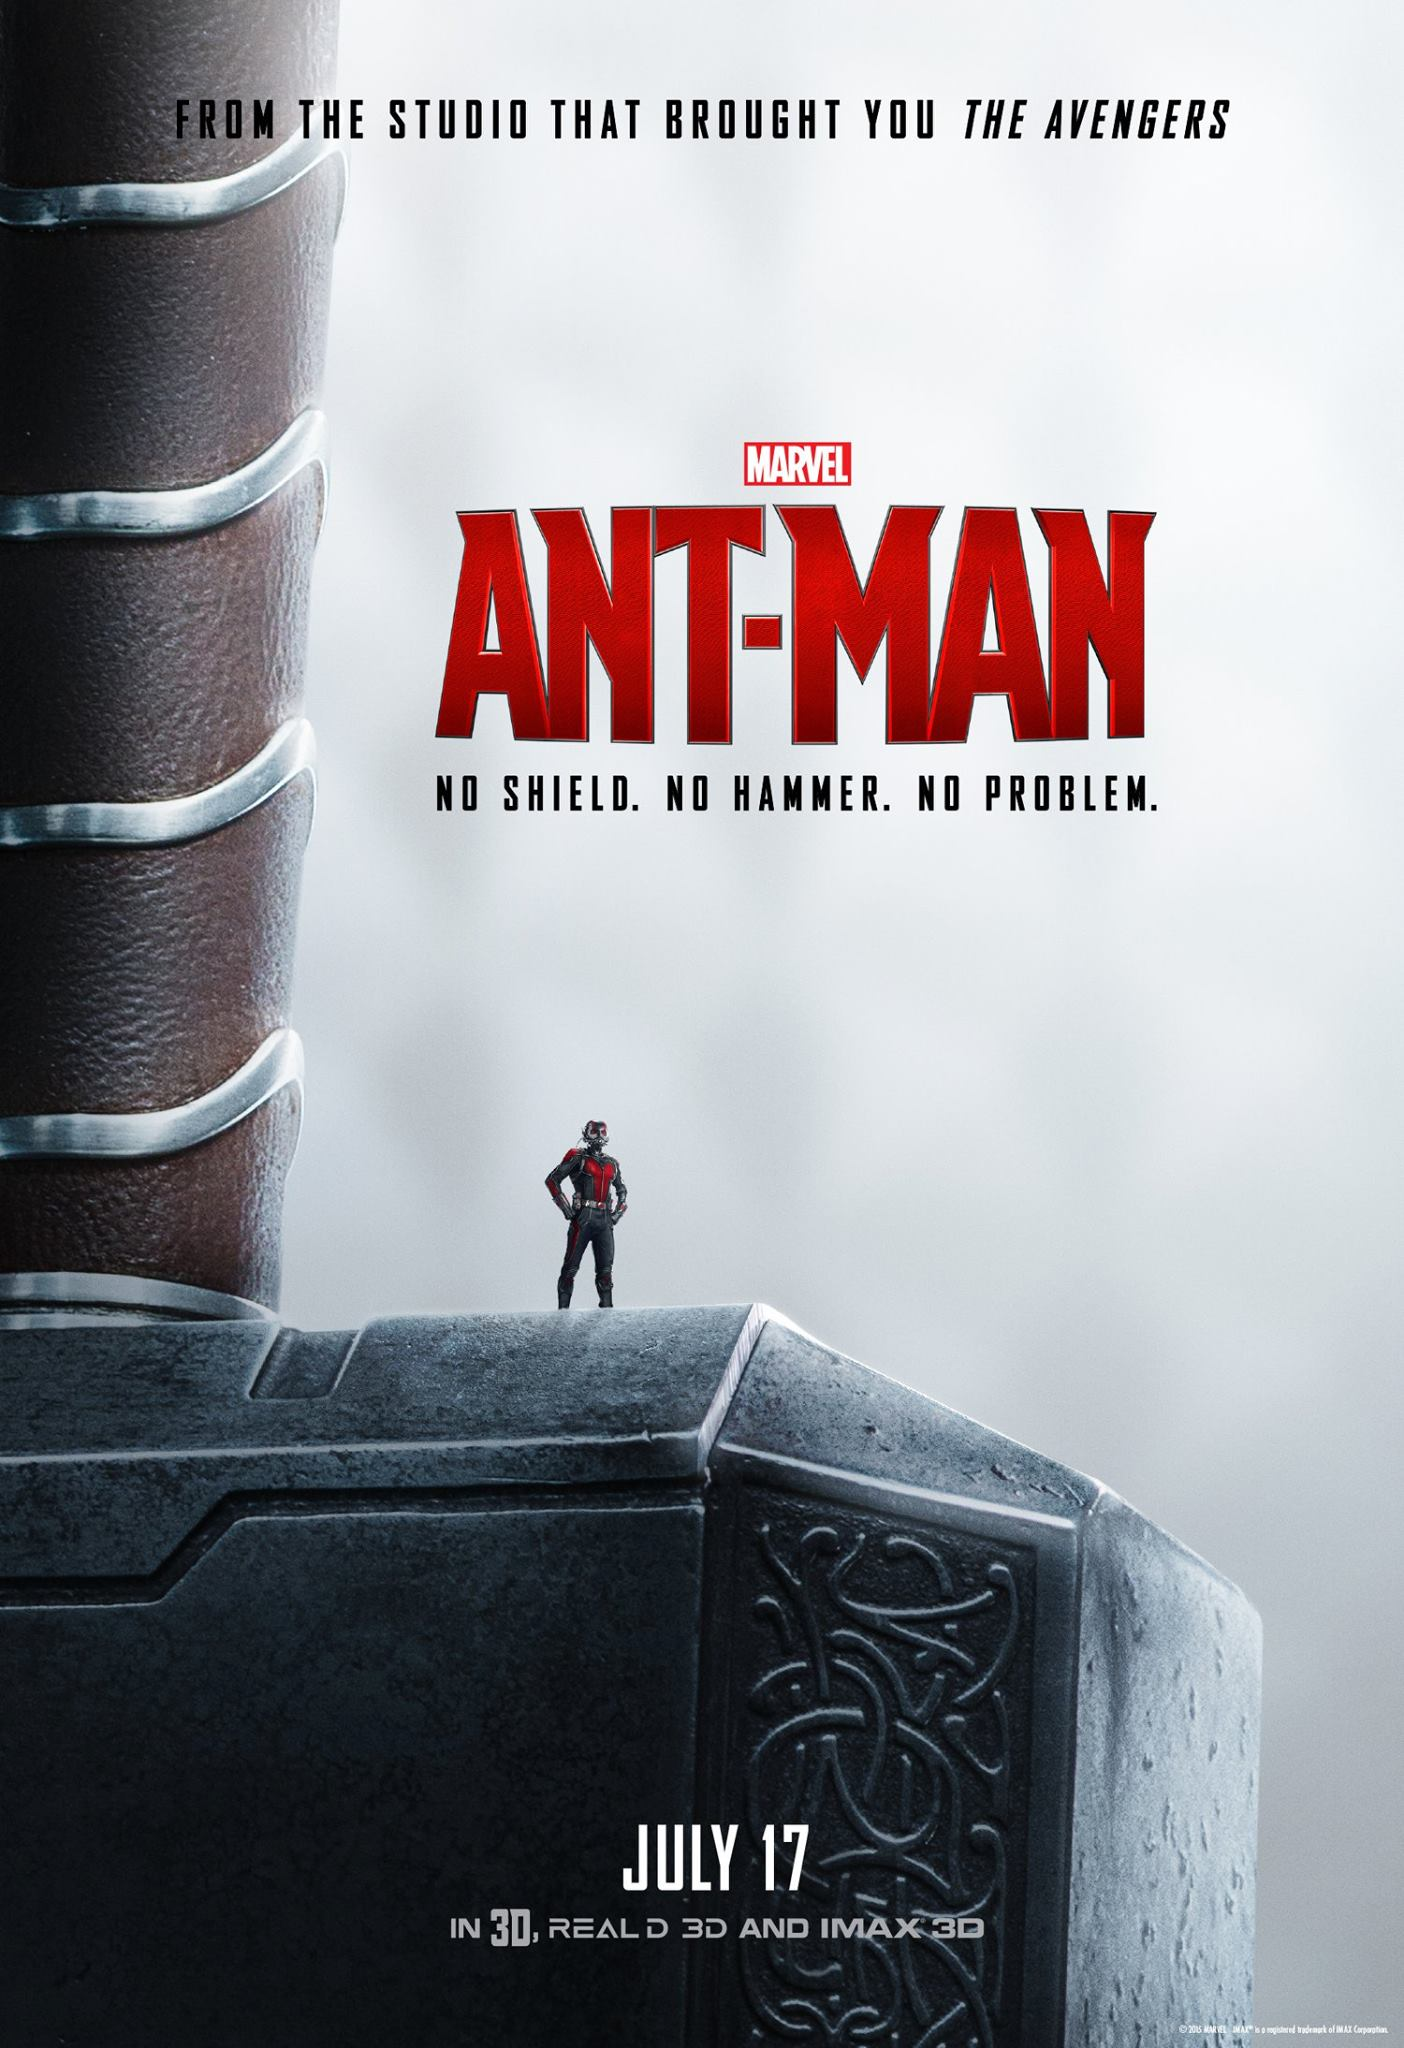 Ant-Man Thor poster